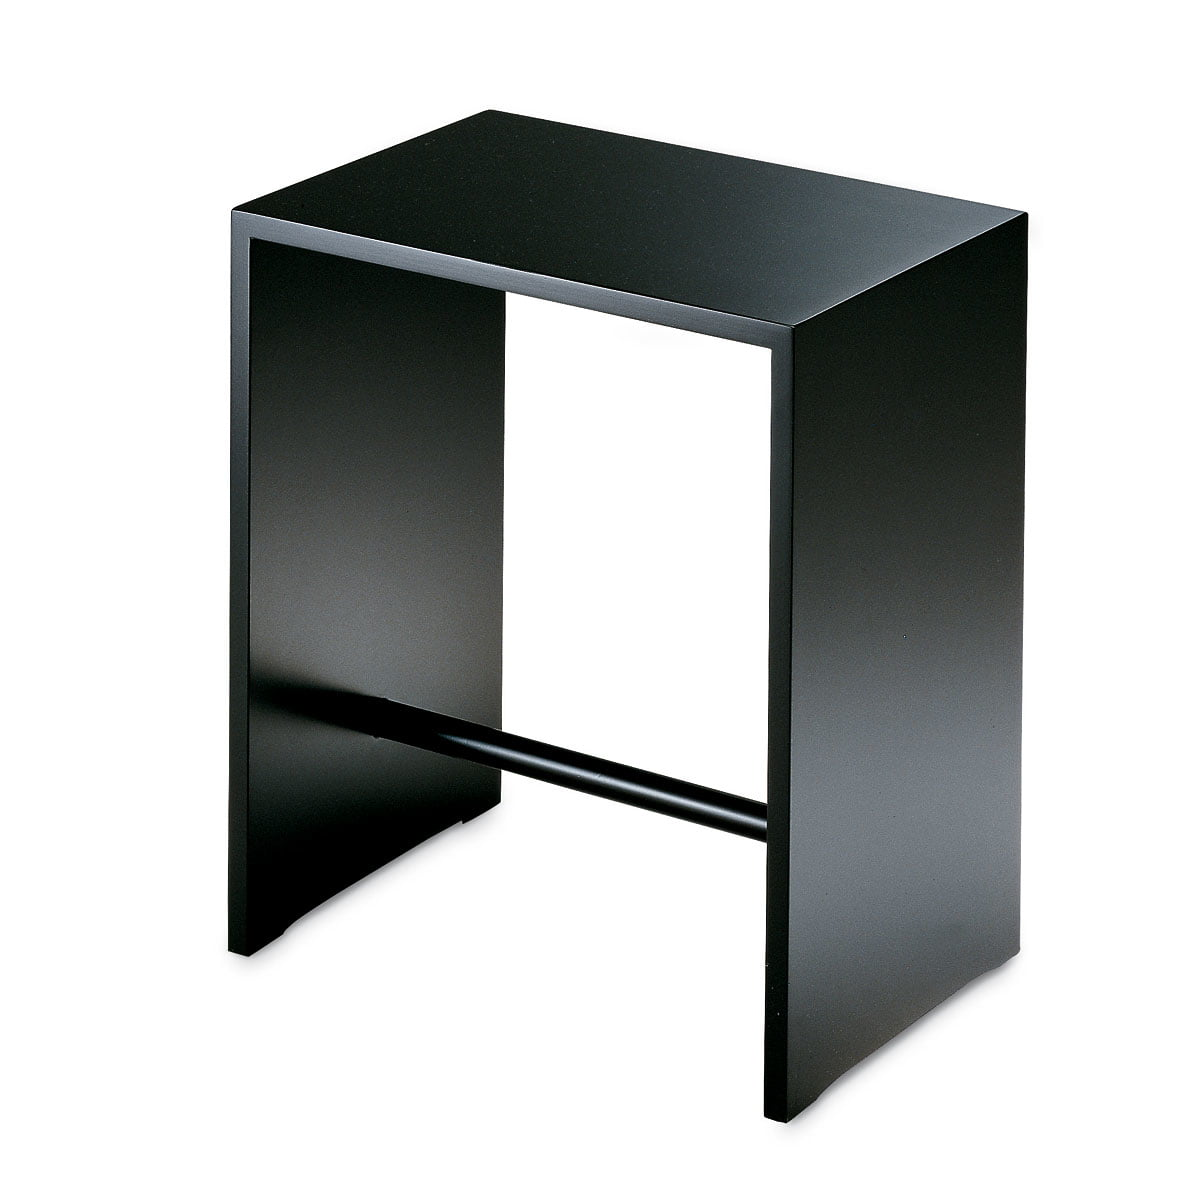 sgabillo max bill hocker von zanotta im shop. Black Bedroom Furniture Sets. Home Design Ideas